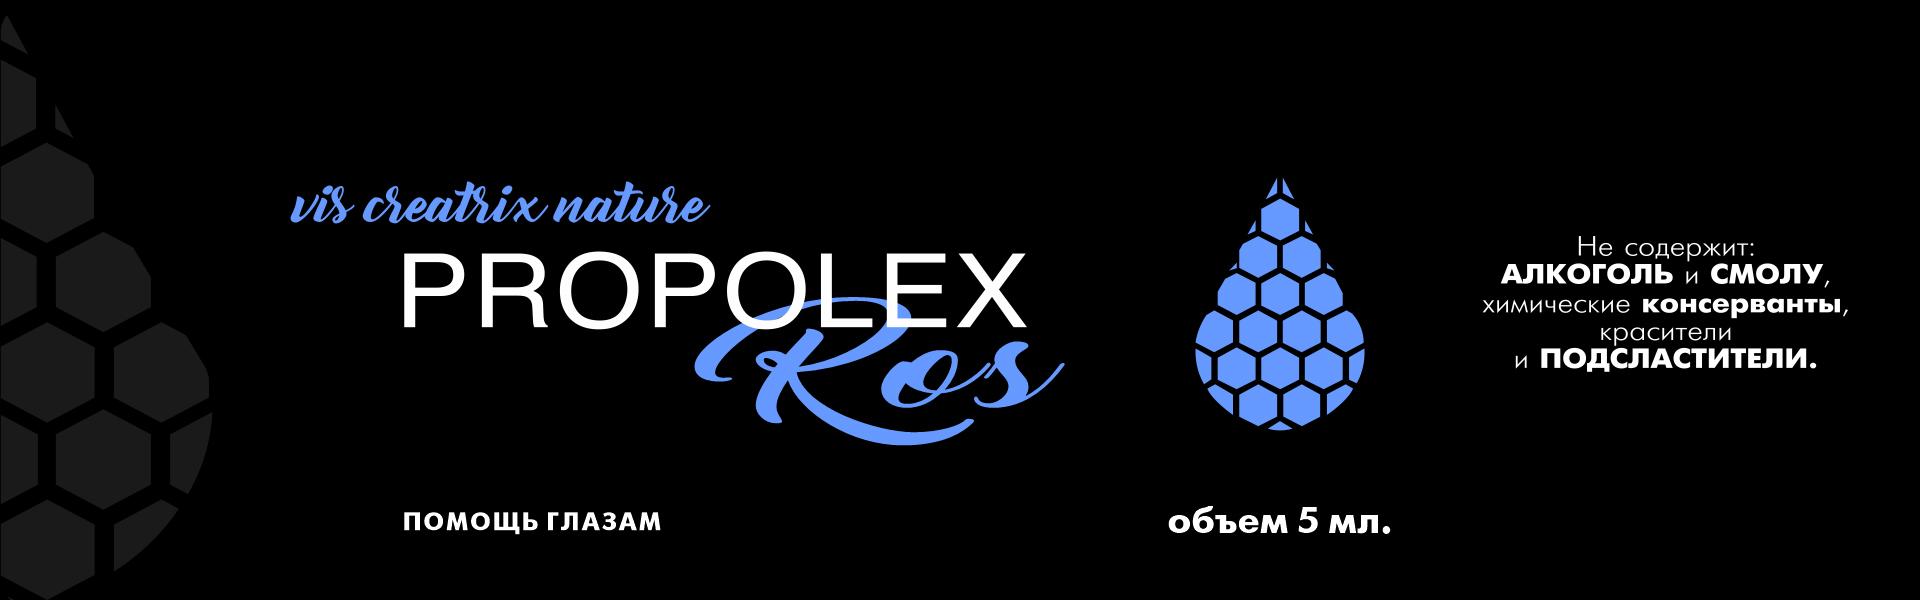 Propolex Ros